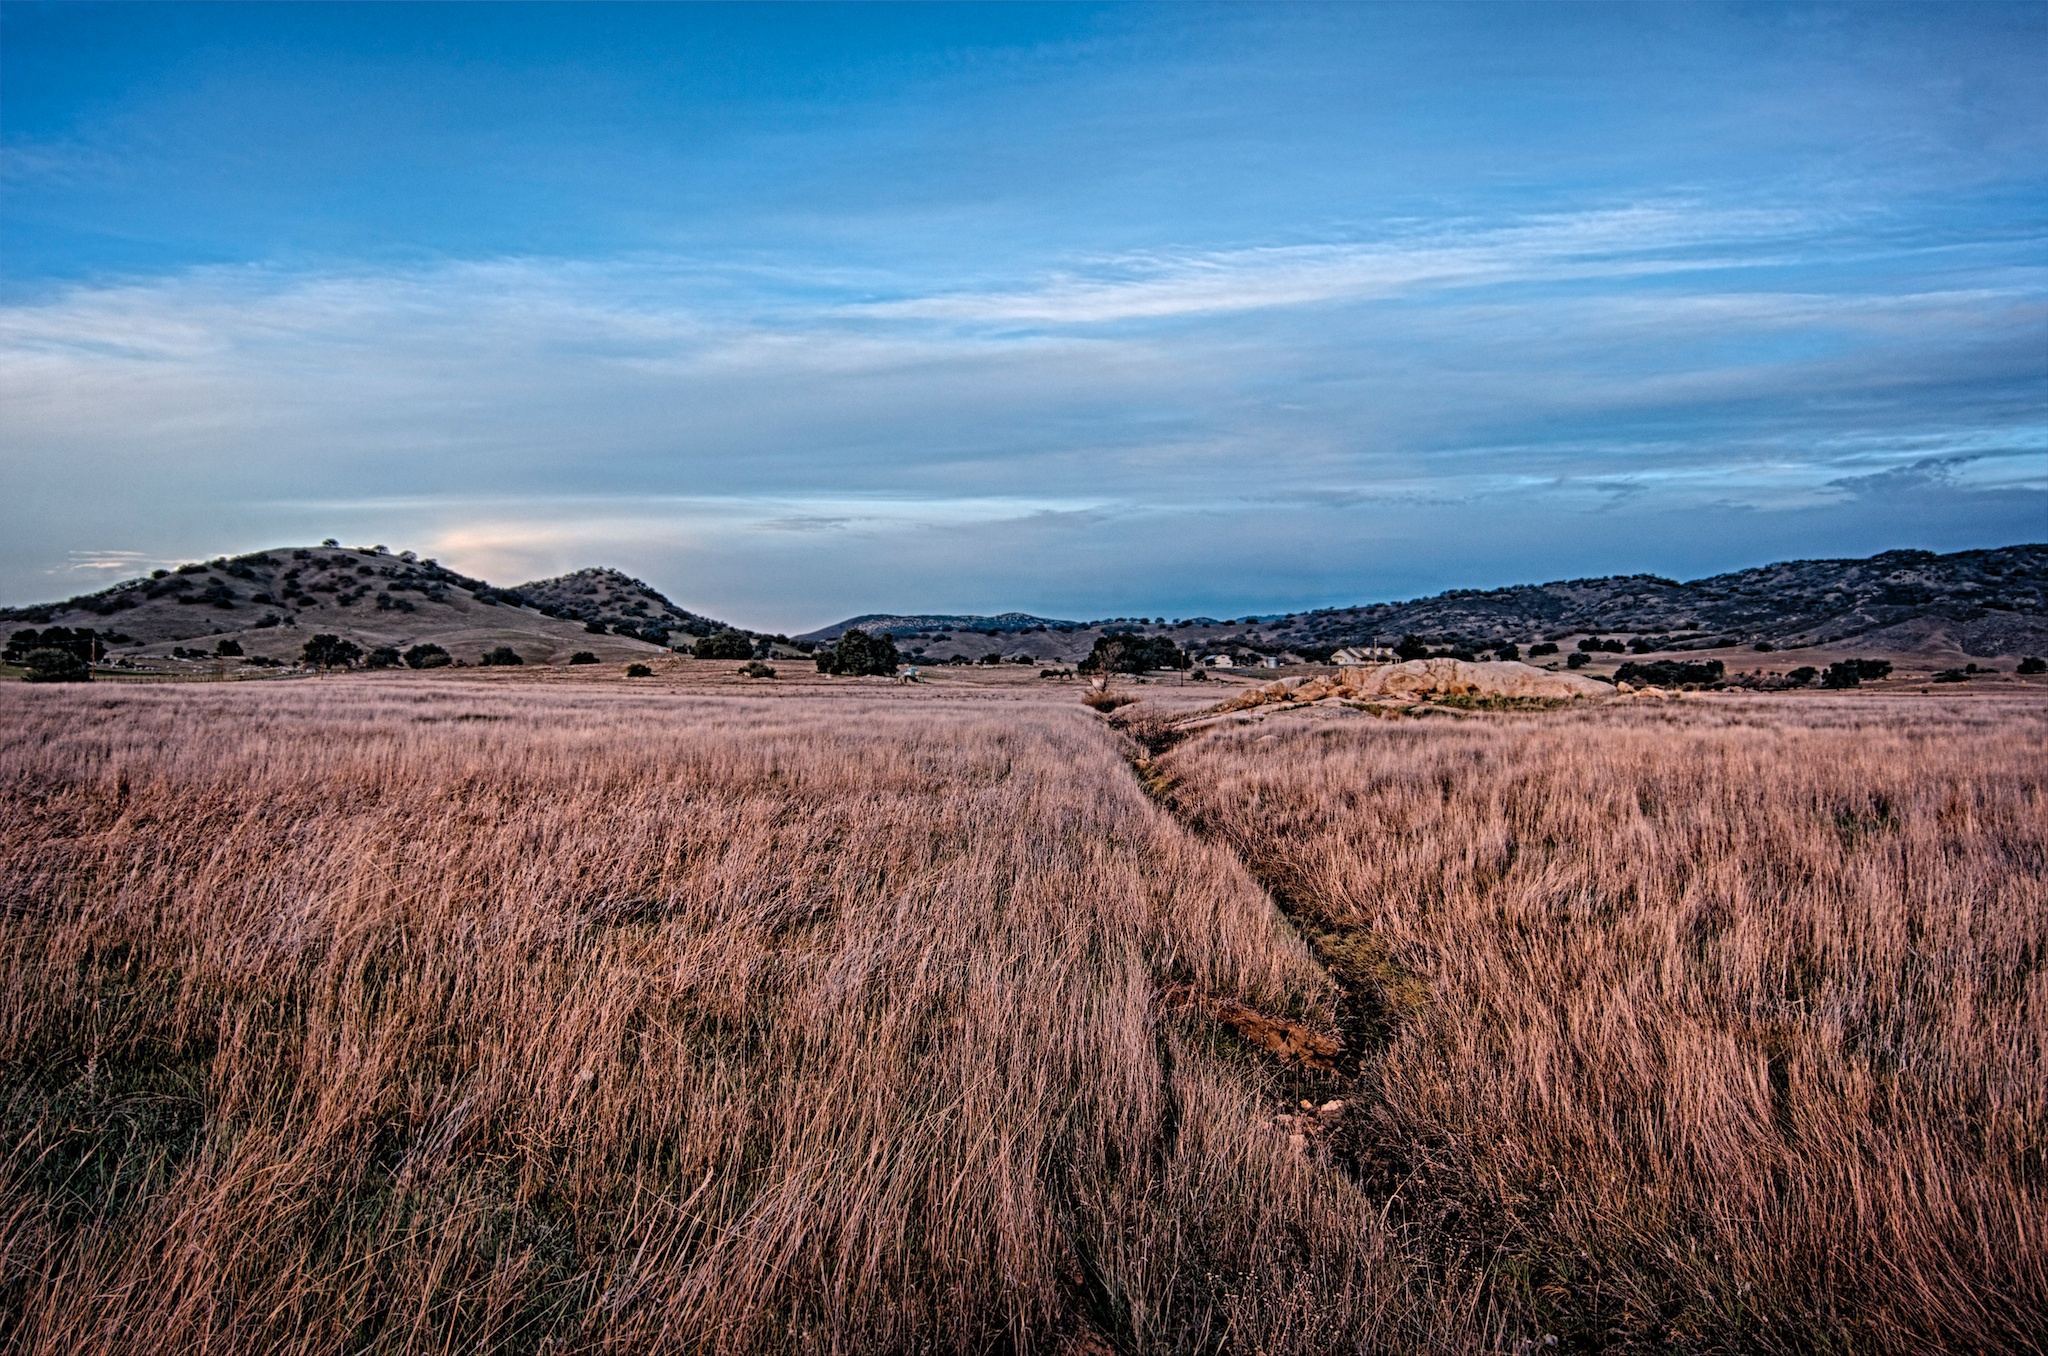 Grassy Meadow, Santa Ysabel, California